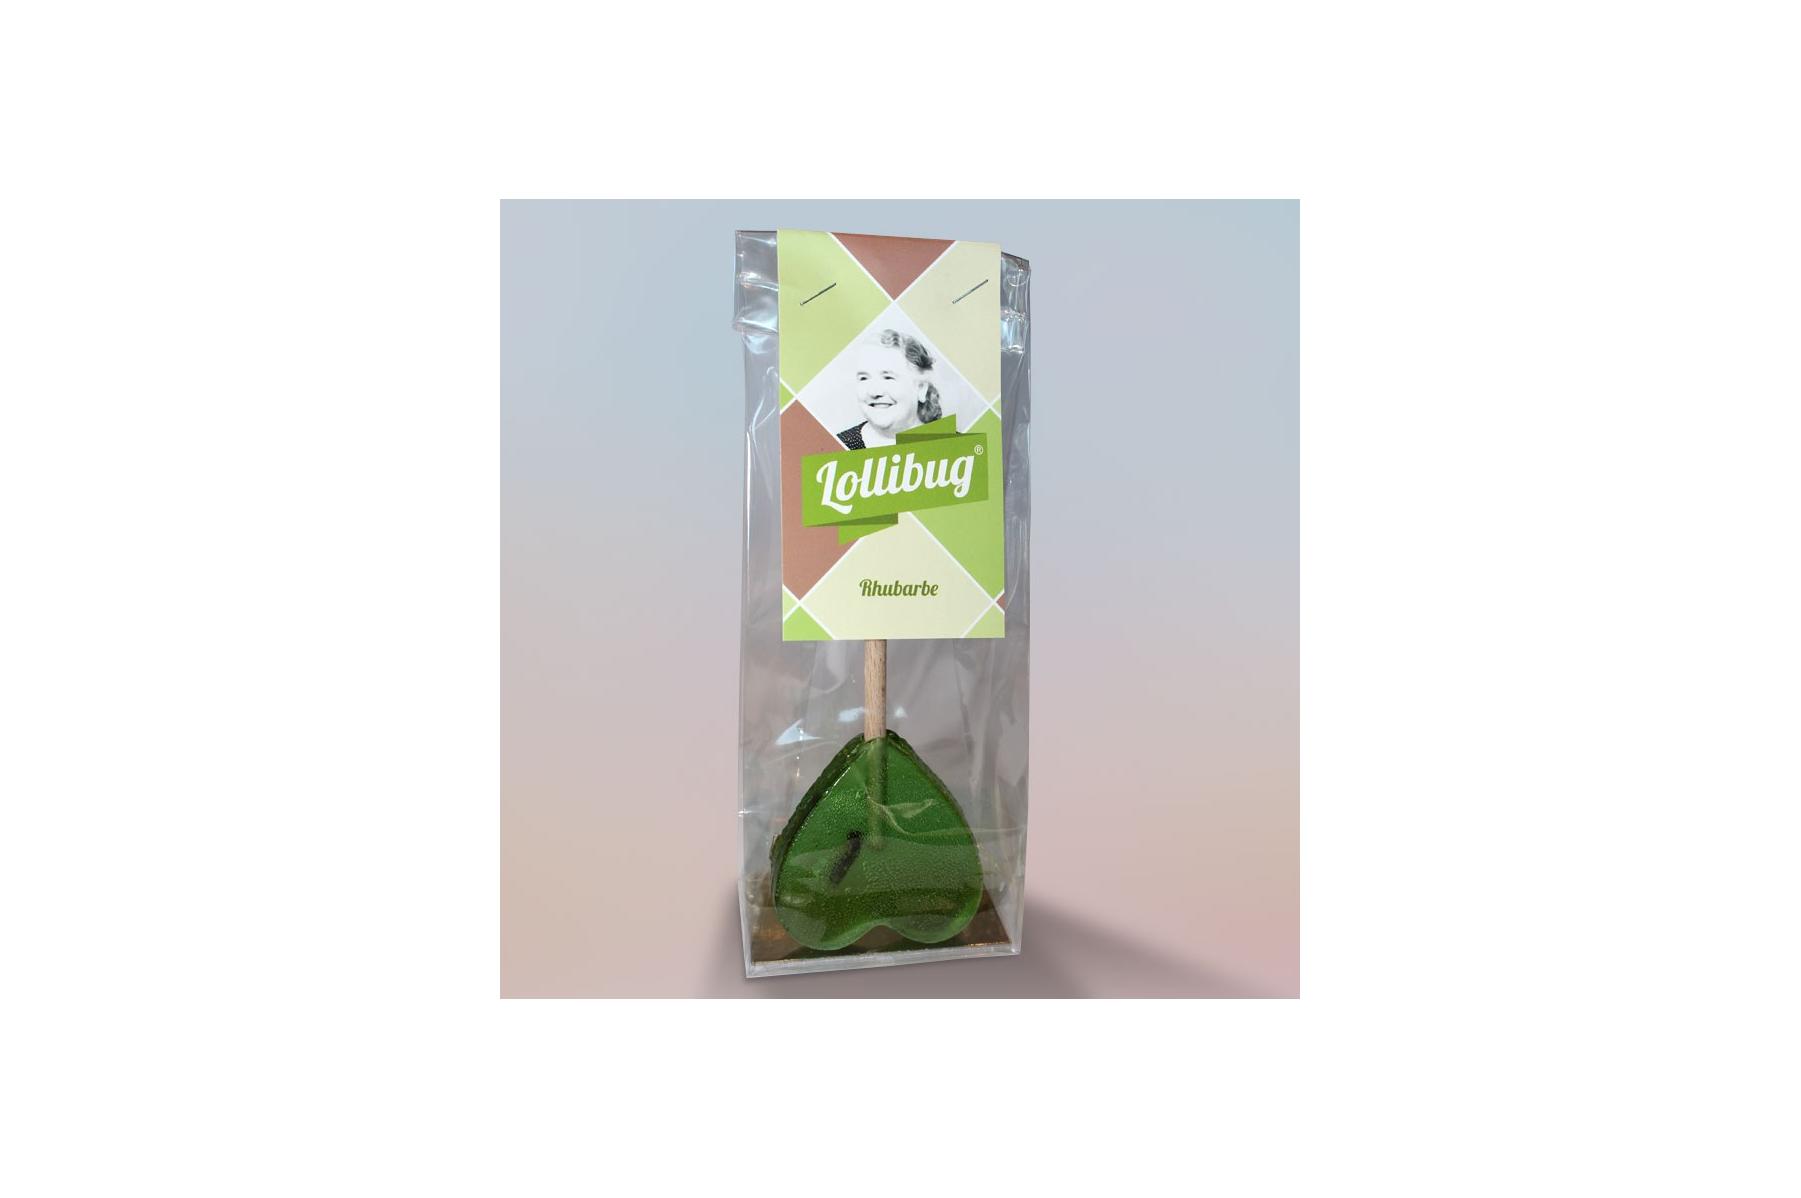 Sucette « Lollibug » Rhubarbe